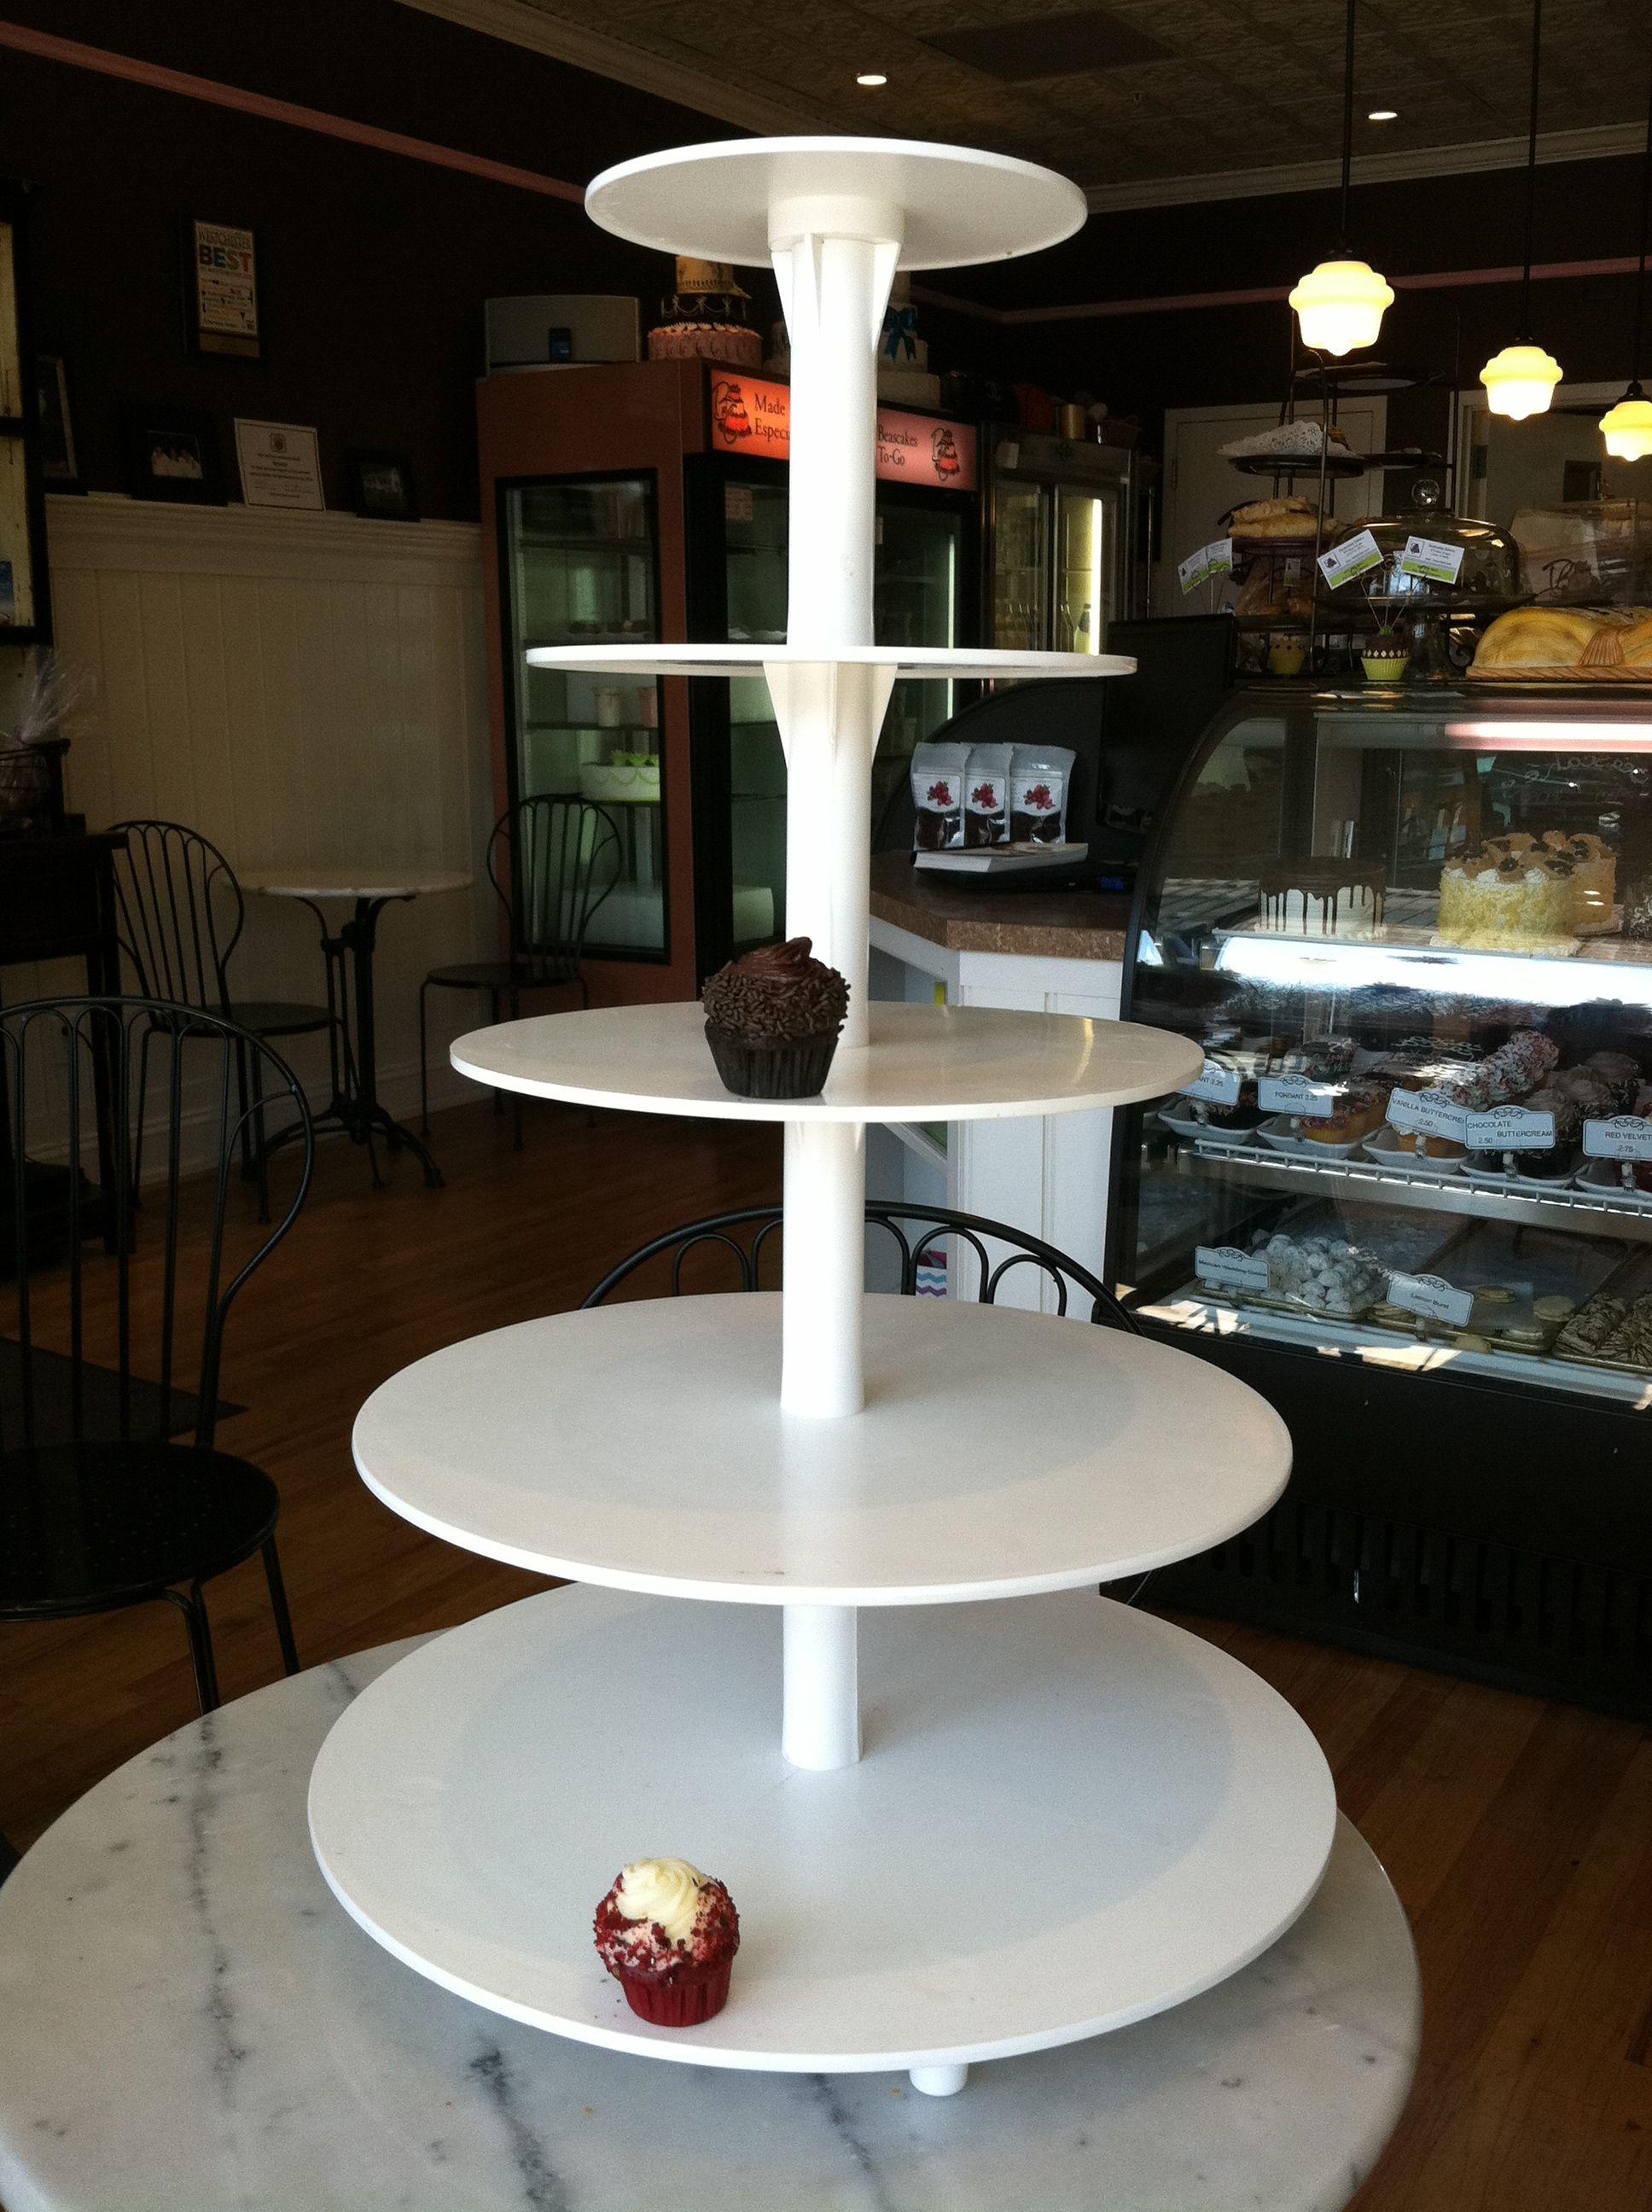 Cupcake tiered wedding cake stand!